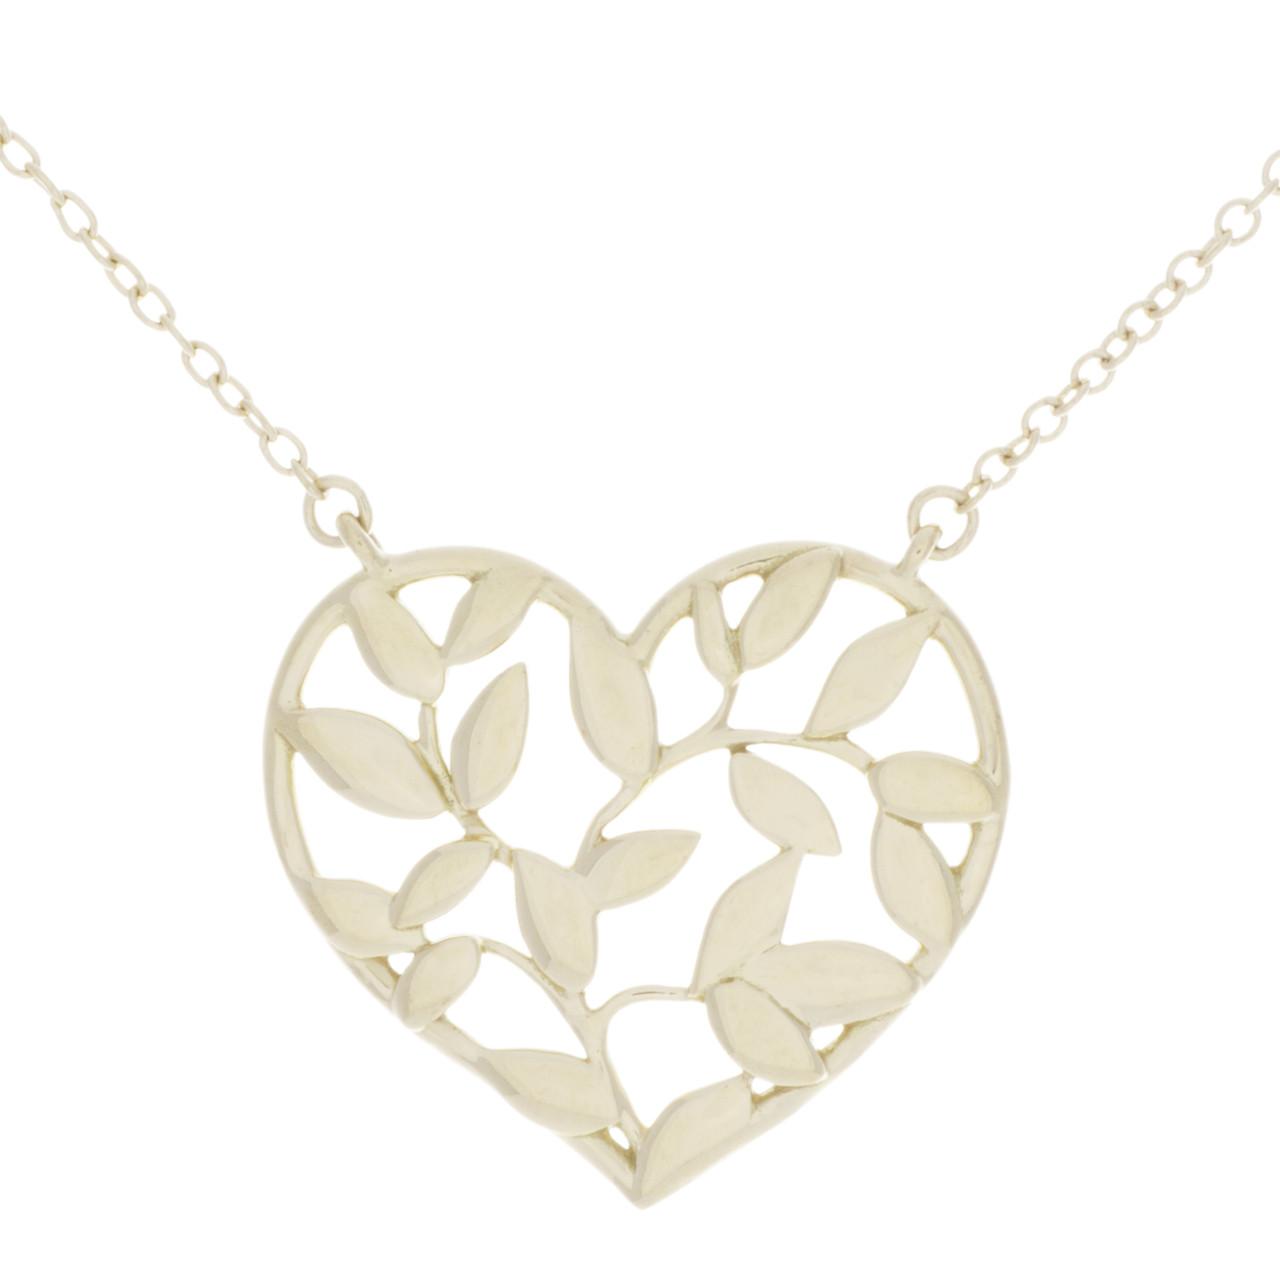 3fe16c436 Tiffany & Co. 18K Yellow Gold Olive Leaf Heart Pendant - modaselle